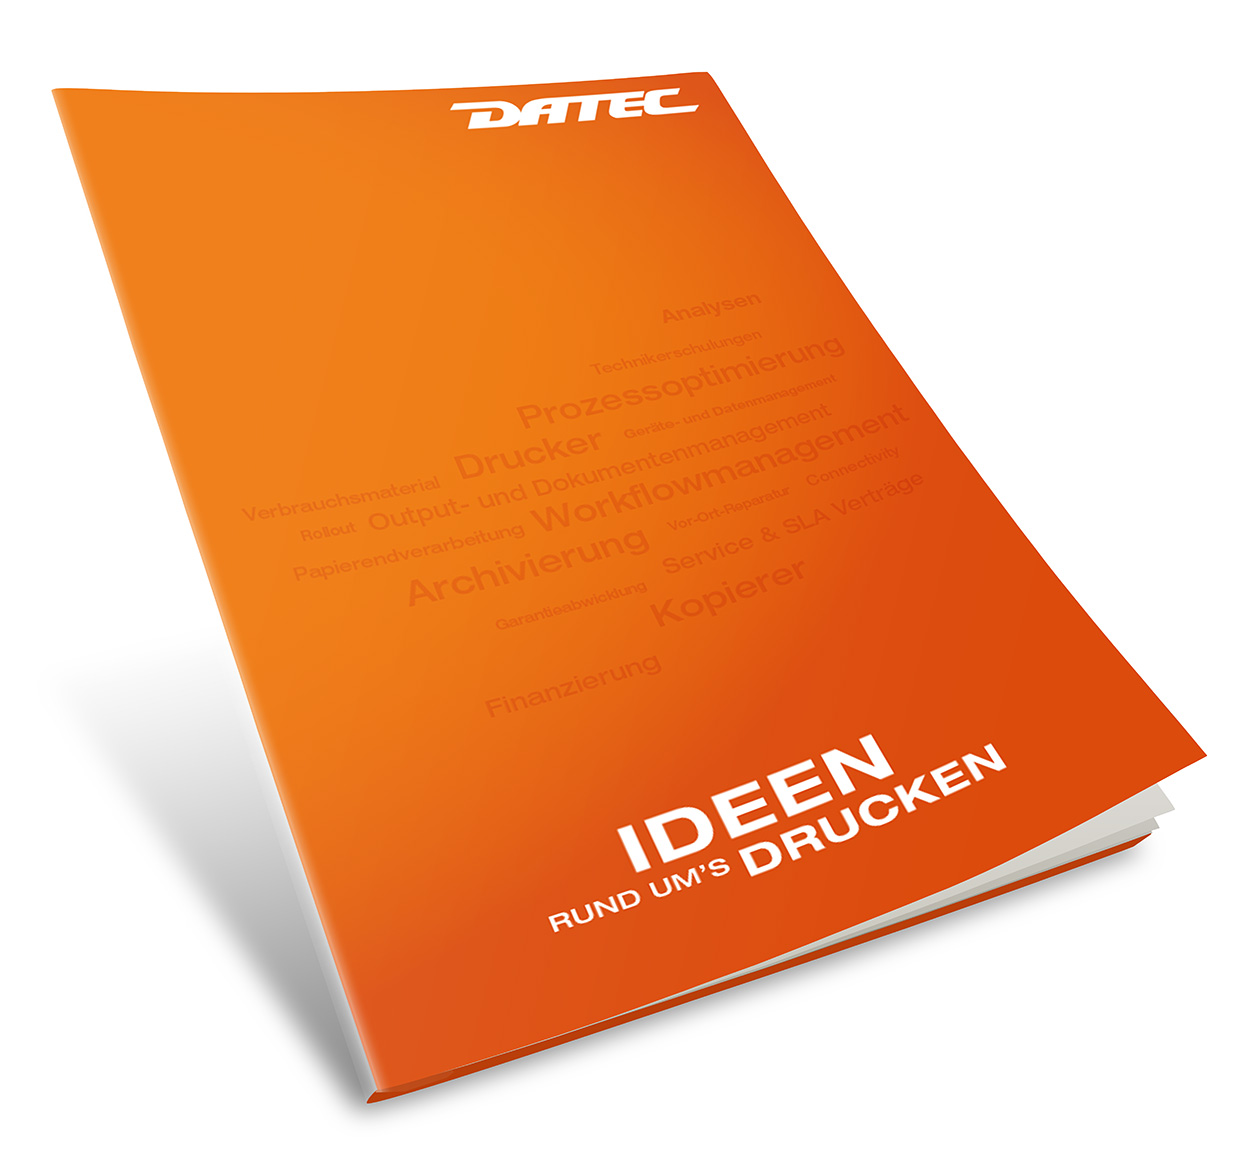 DATEC Imagebroschüre Titelseite